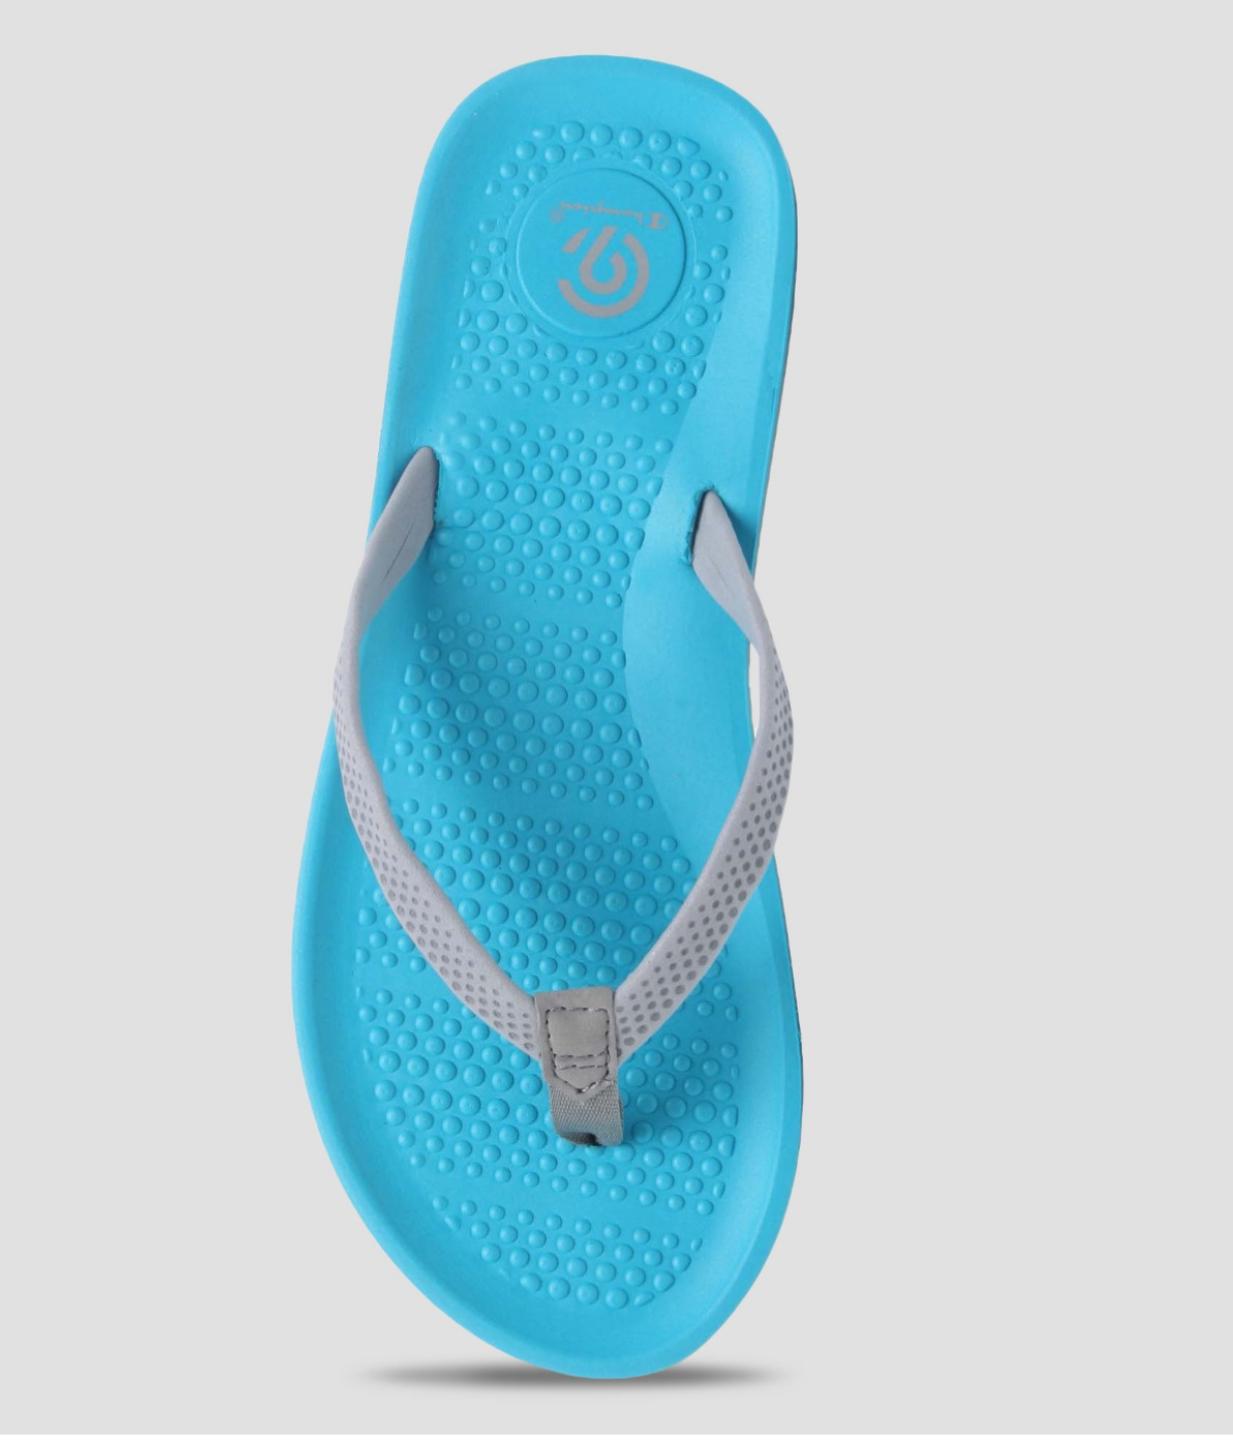 *C9 Champion Women/'s Veanna Cushion Lite Comfort Flip Flop Sandals Black